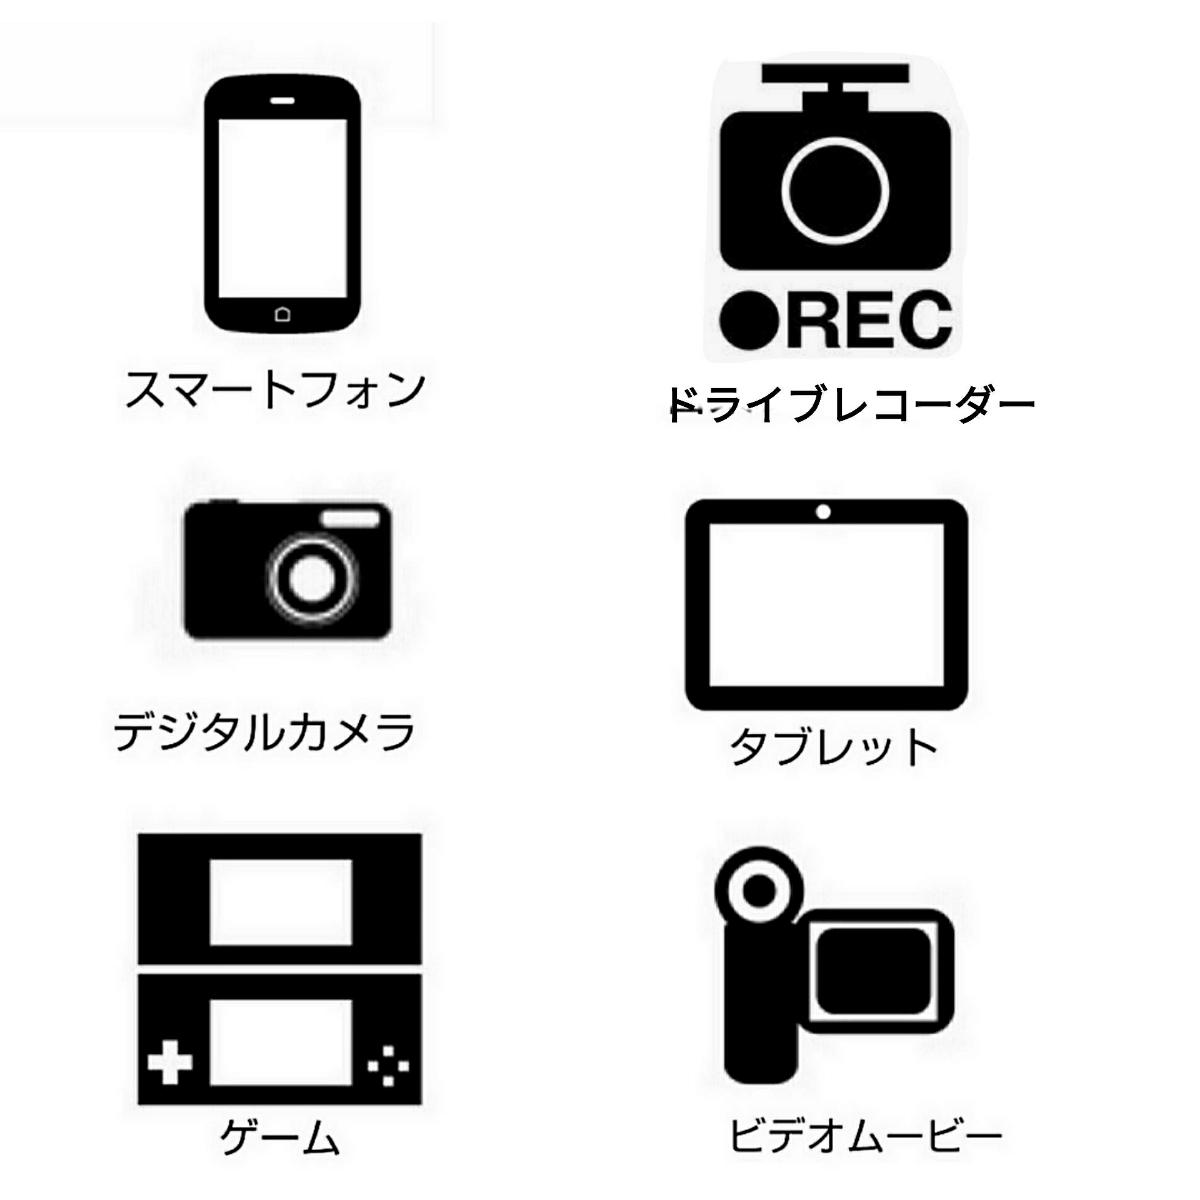 microSDHC32GBメモリーカード(HI-DISC)HDMCSDH32GCL10UIJP3【1円スタート出品・新品・送料無料】_画像4